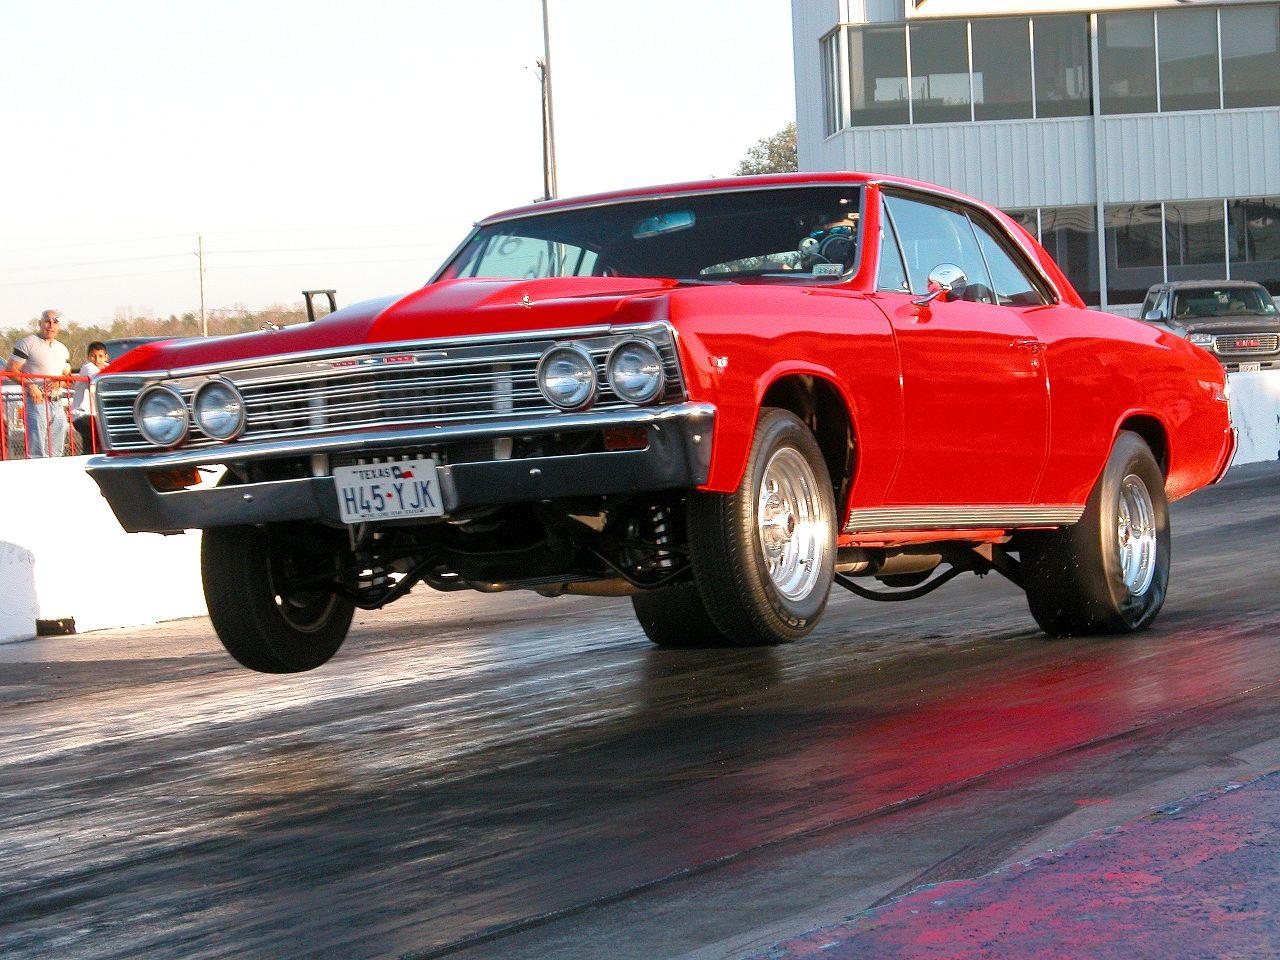 67 Chevelle Drag Car